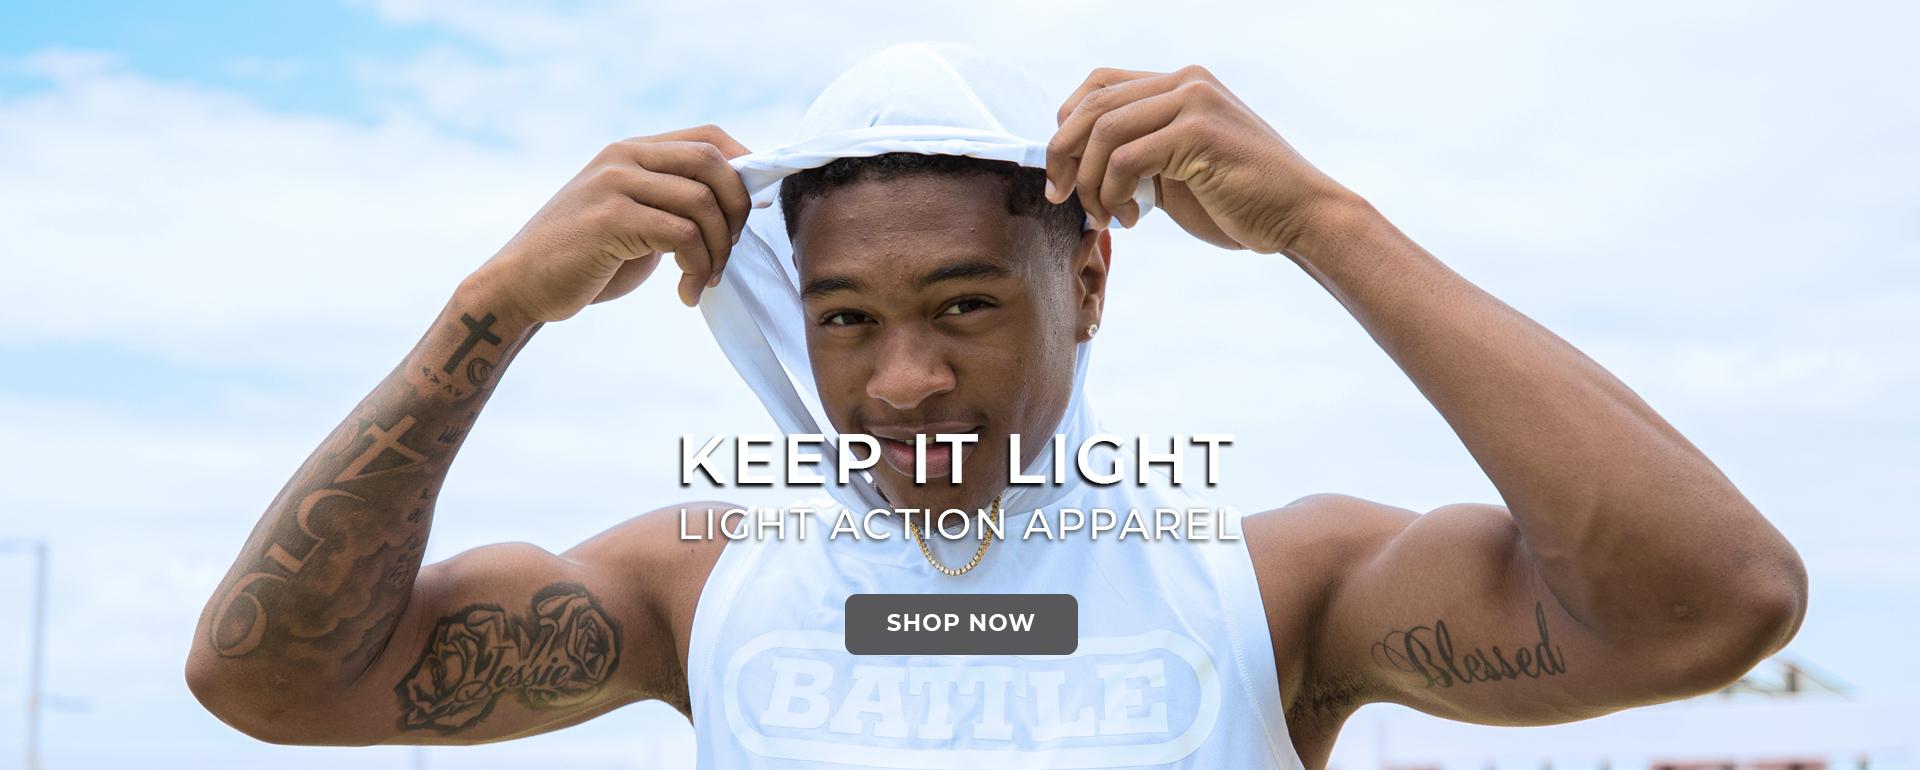 Light Action Apparel